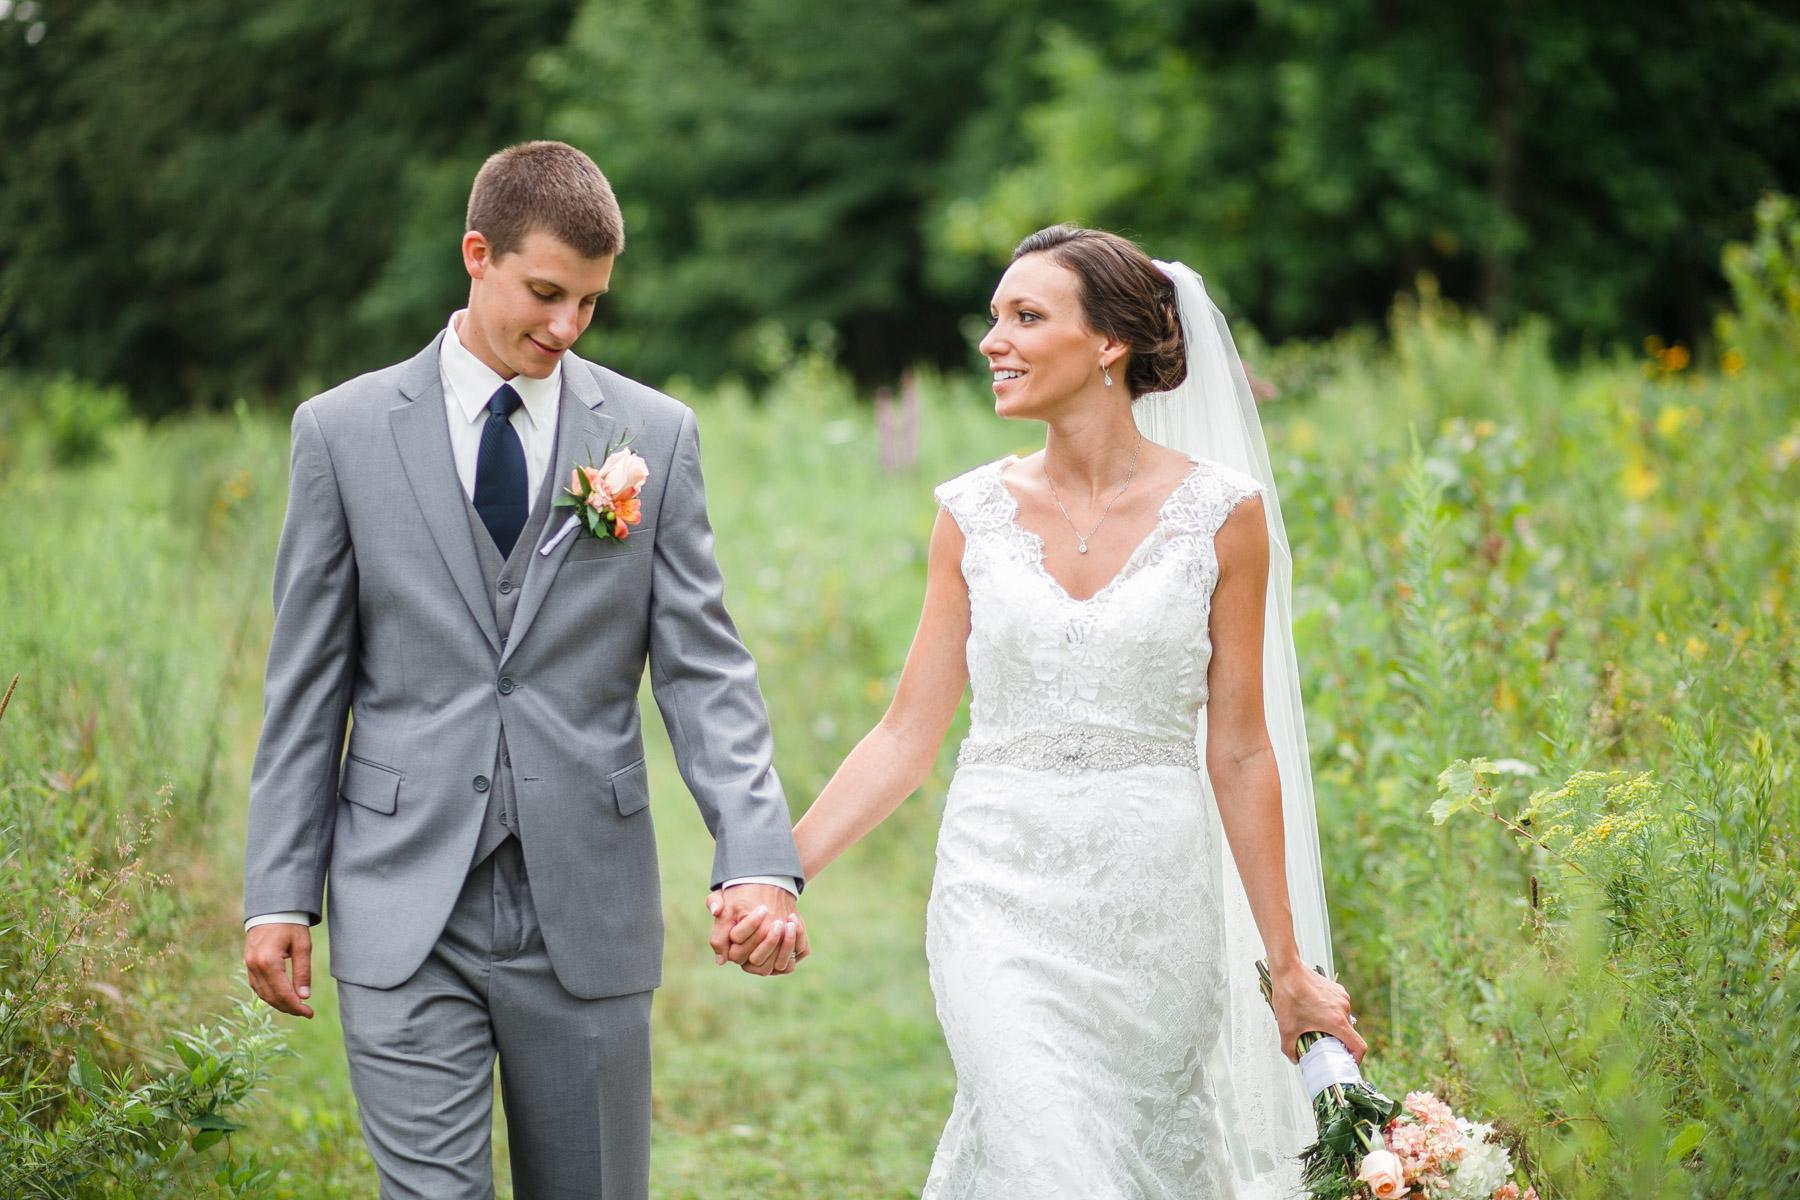 wildwood-park-wedding-photos-63.jpg